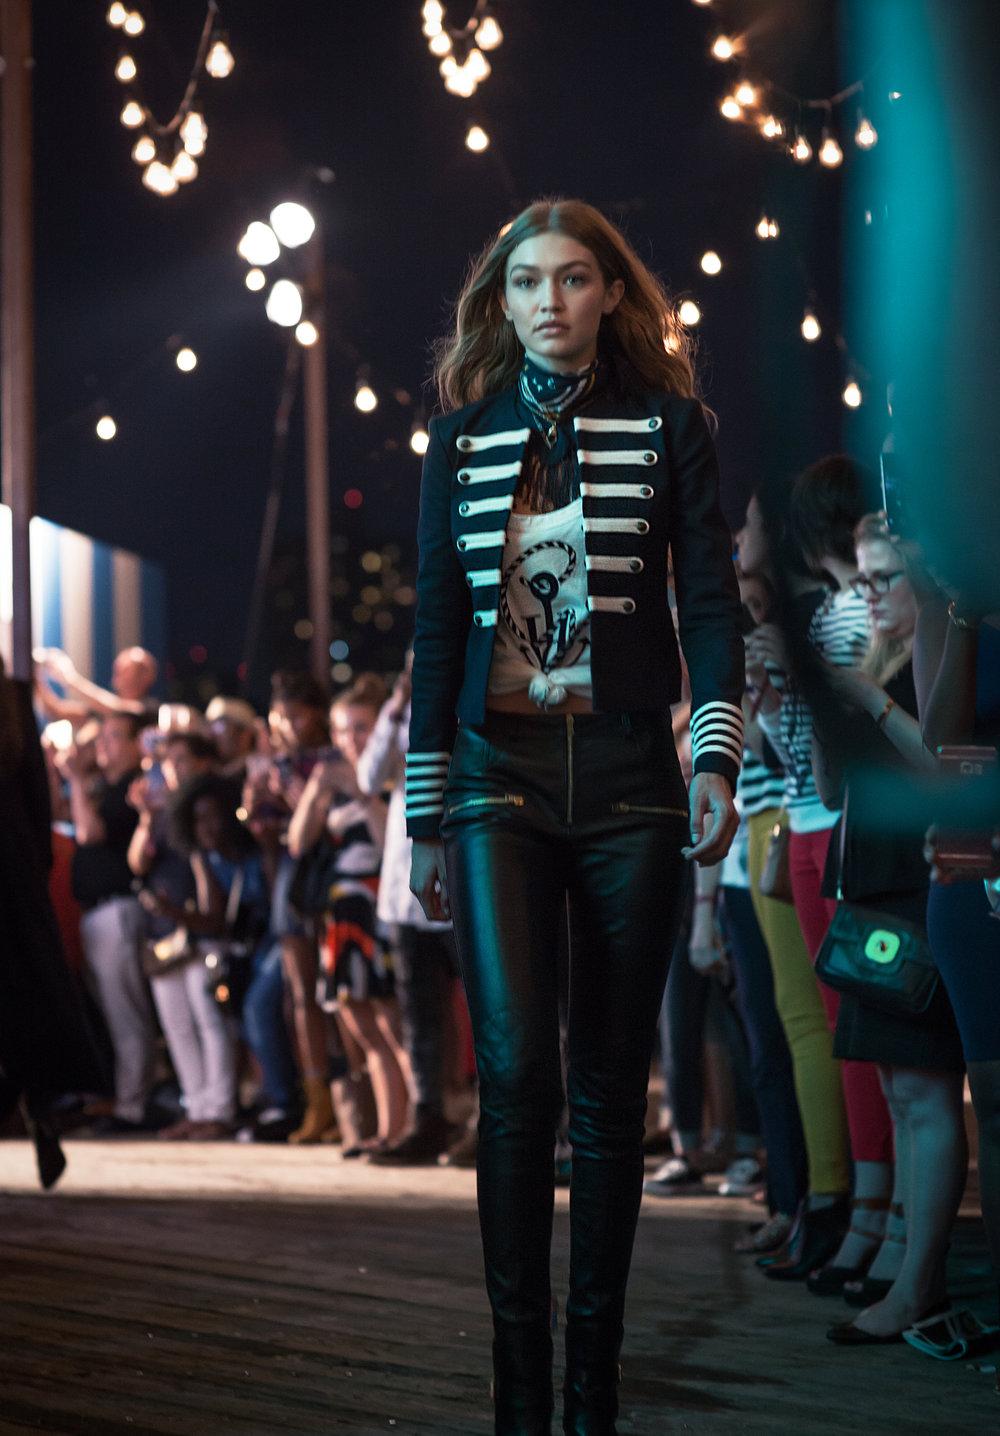 raquel_paiva_tommy_x_gigi_fashion_show_blogger_street_style